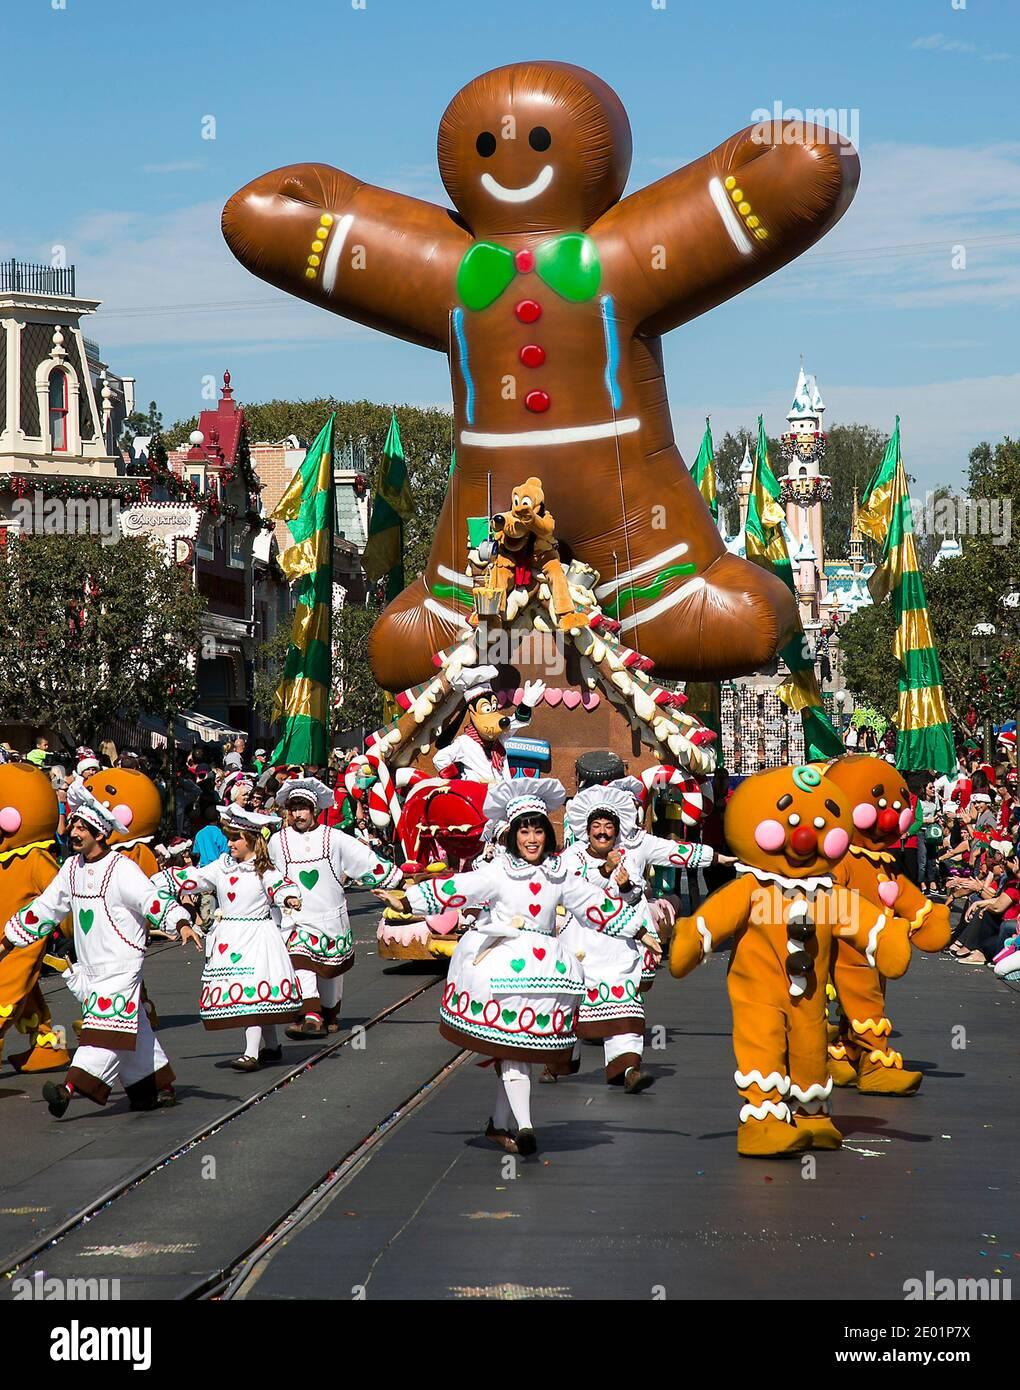 Paris Tx Christmas Parade 2021 Christmas Day Parade High Resolution Stock Photography And Images Alamy